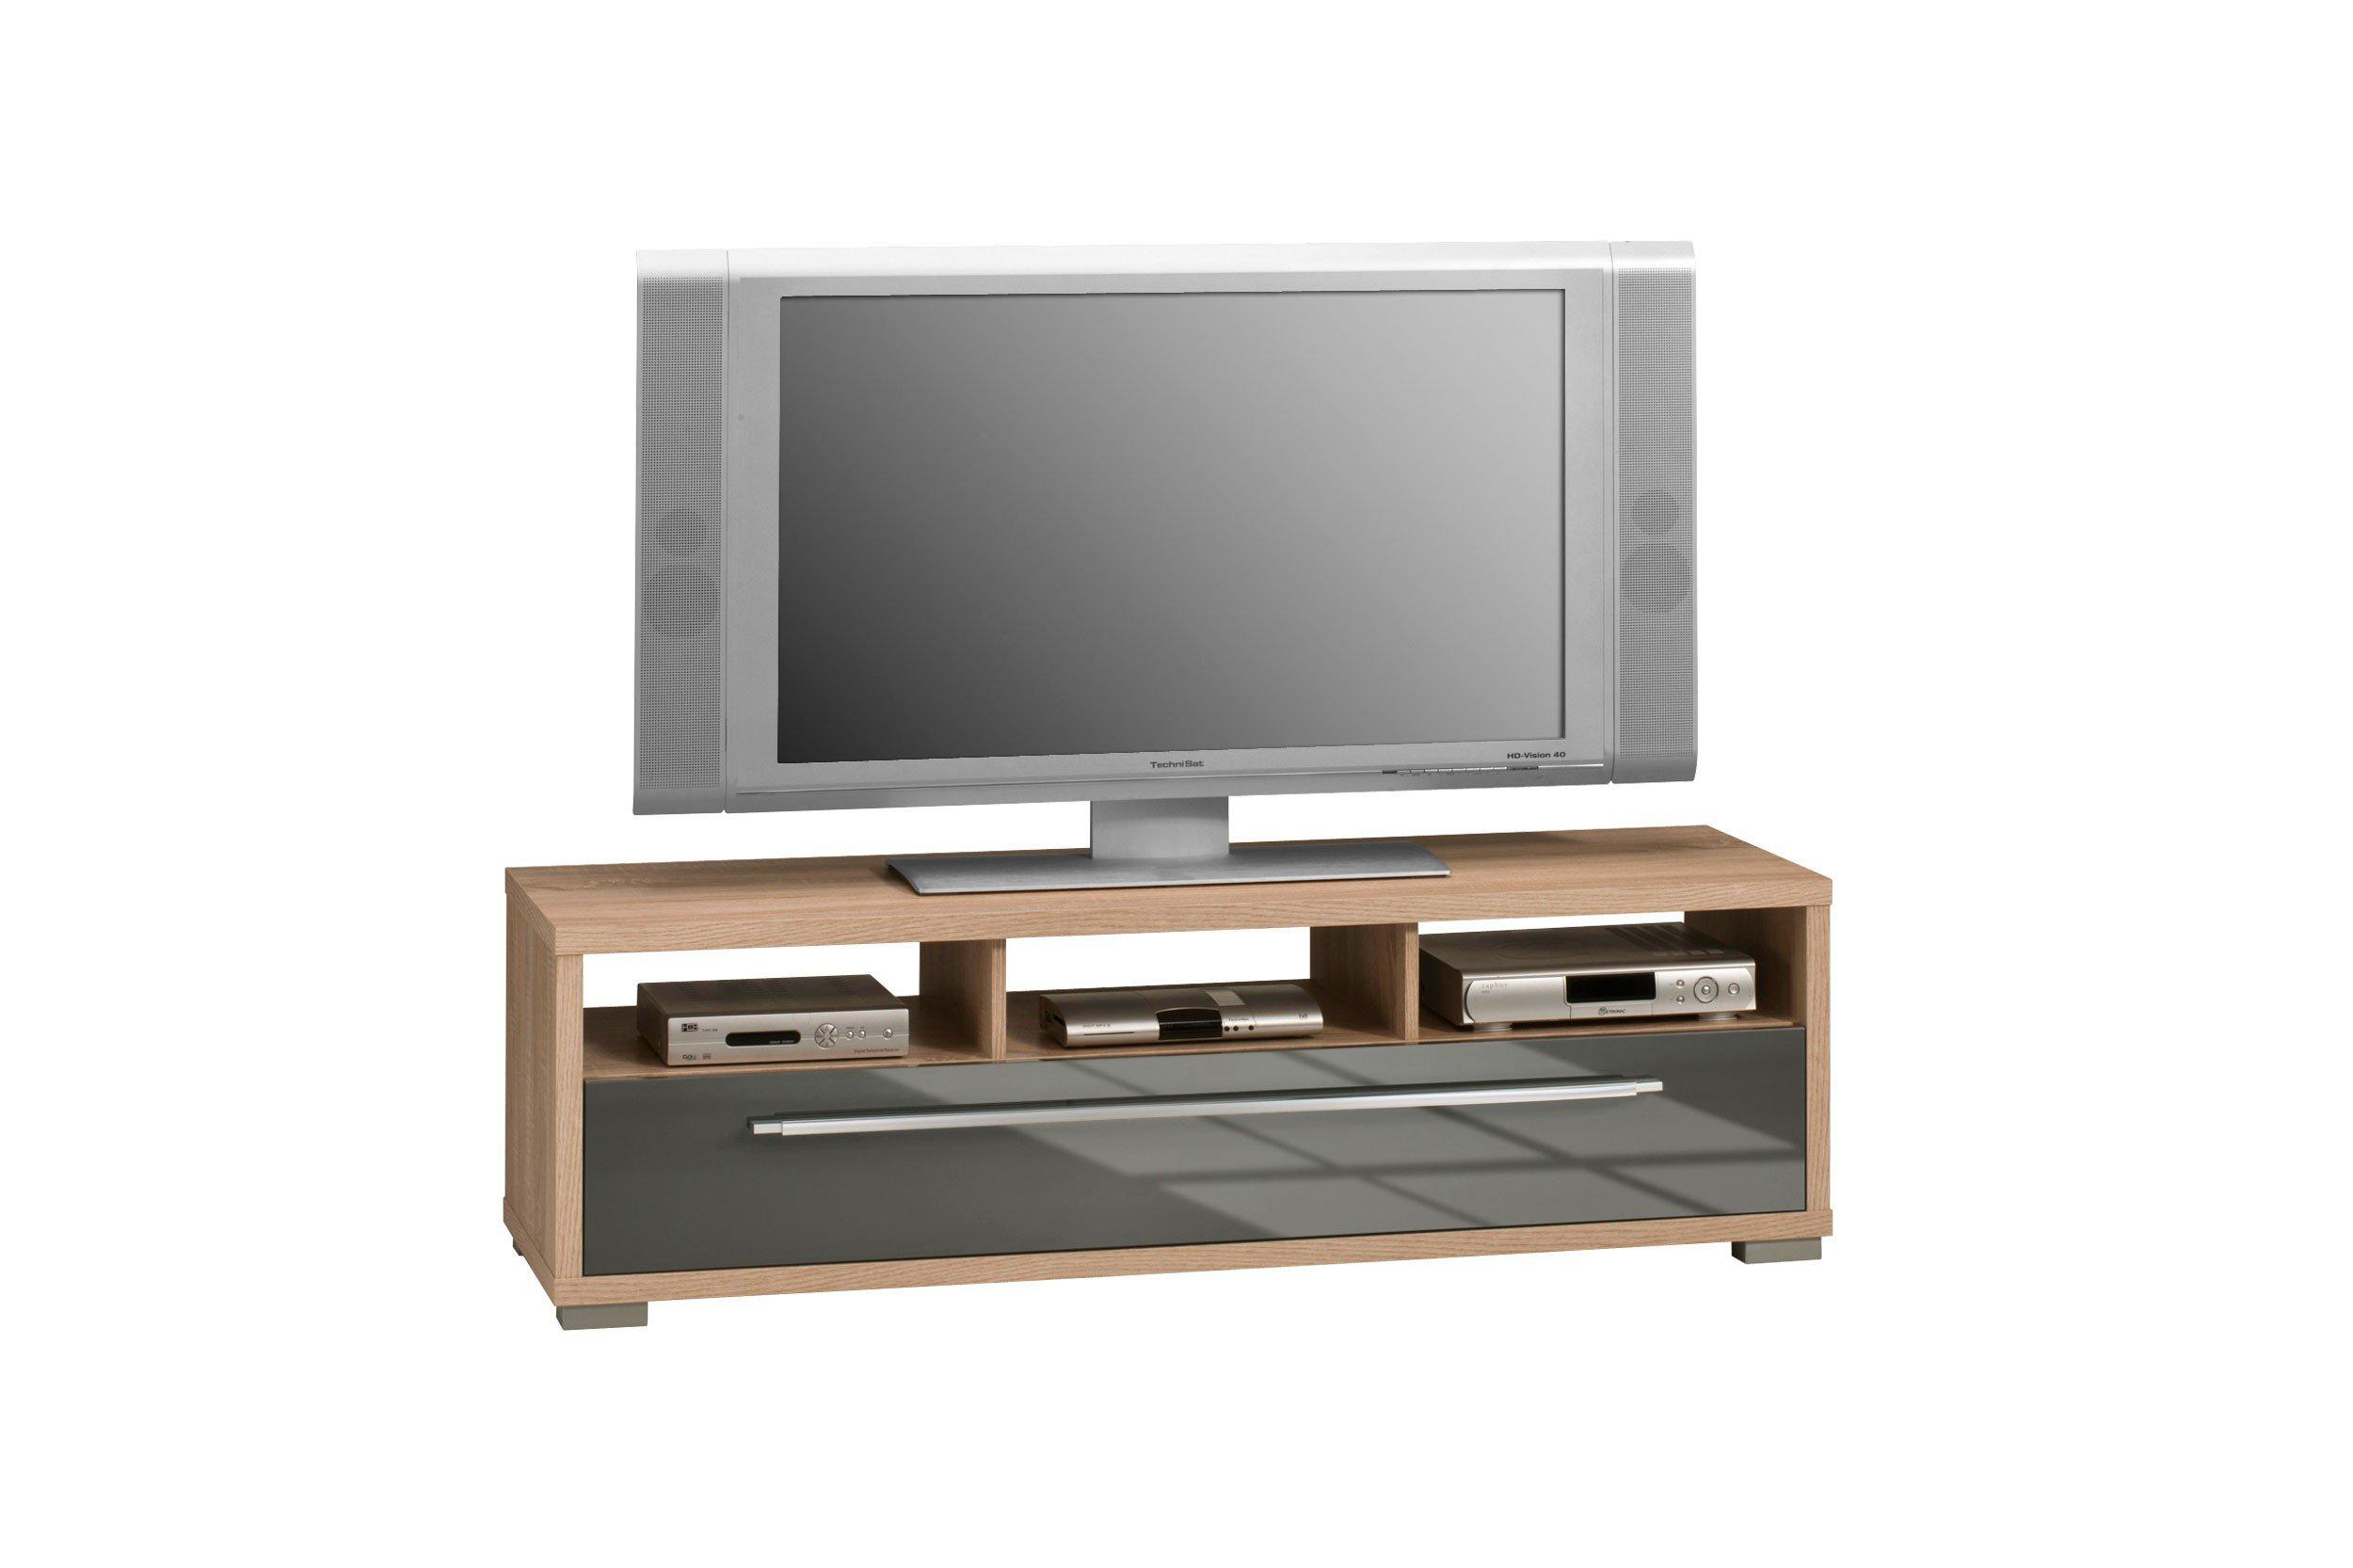 maja m bel lowboard 7645 wei schwarz m bel letz ihr. Black Bedroom Furniture Sets. Home Design Ideas